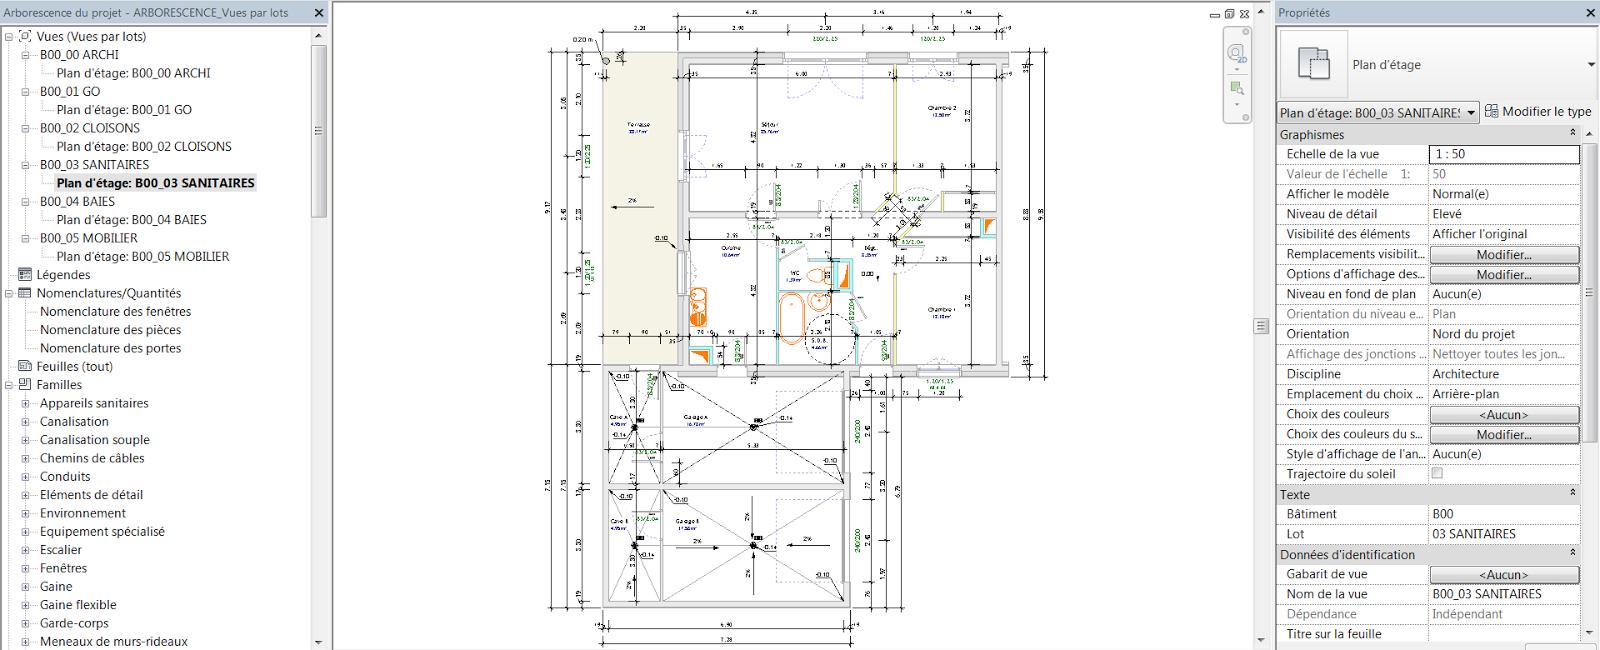 revit m mo revit 2014 organisation de l 39 arborescence tri par lots. Black Bedroom Furniture Sets. Home Design Ideas